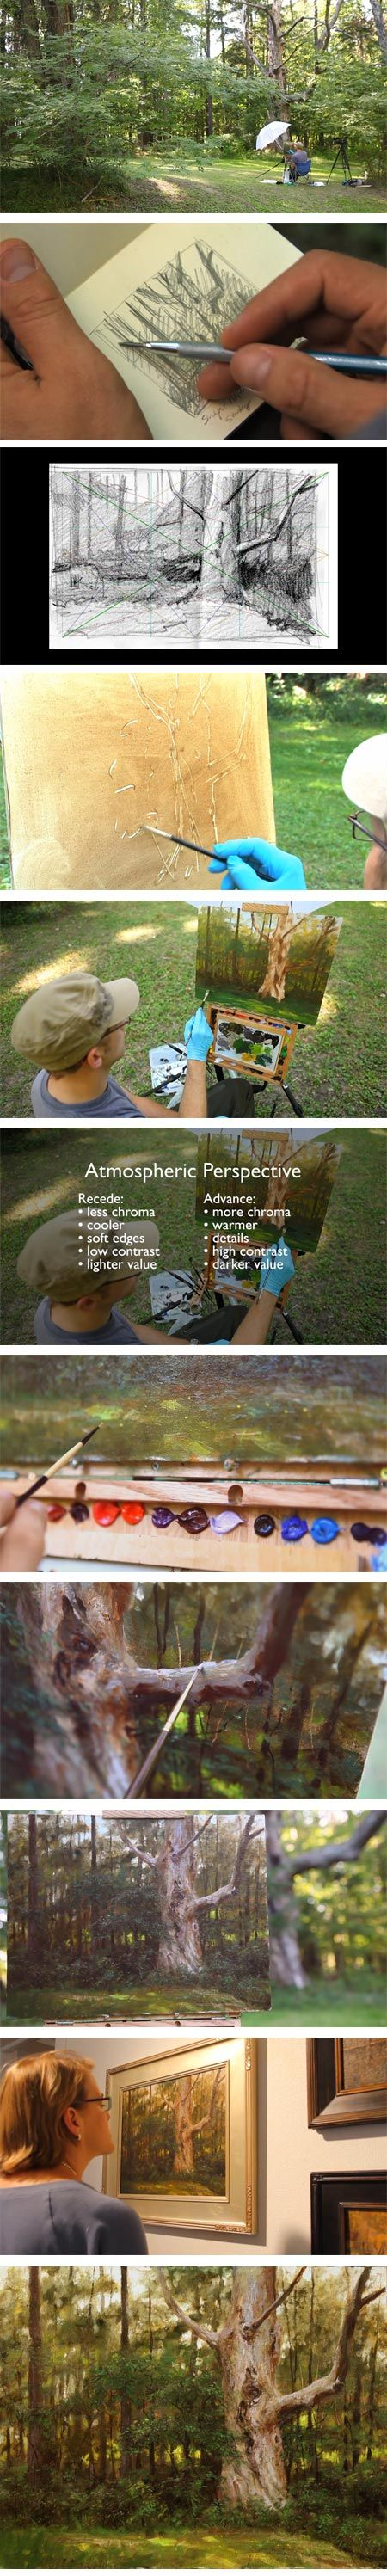 Painting en Plein Air: Resolving the Landscape, Thomas Kegler